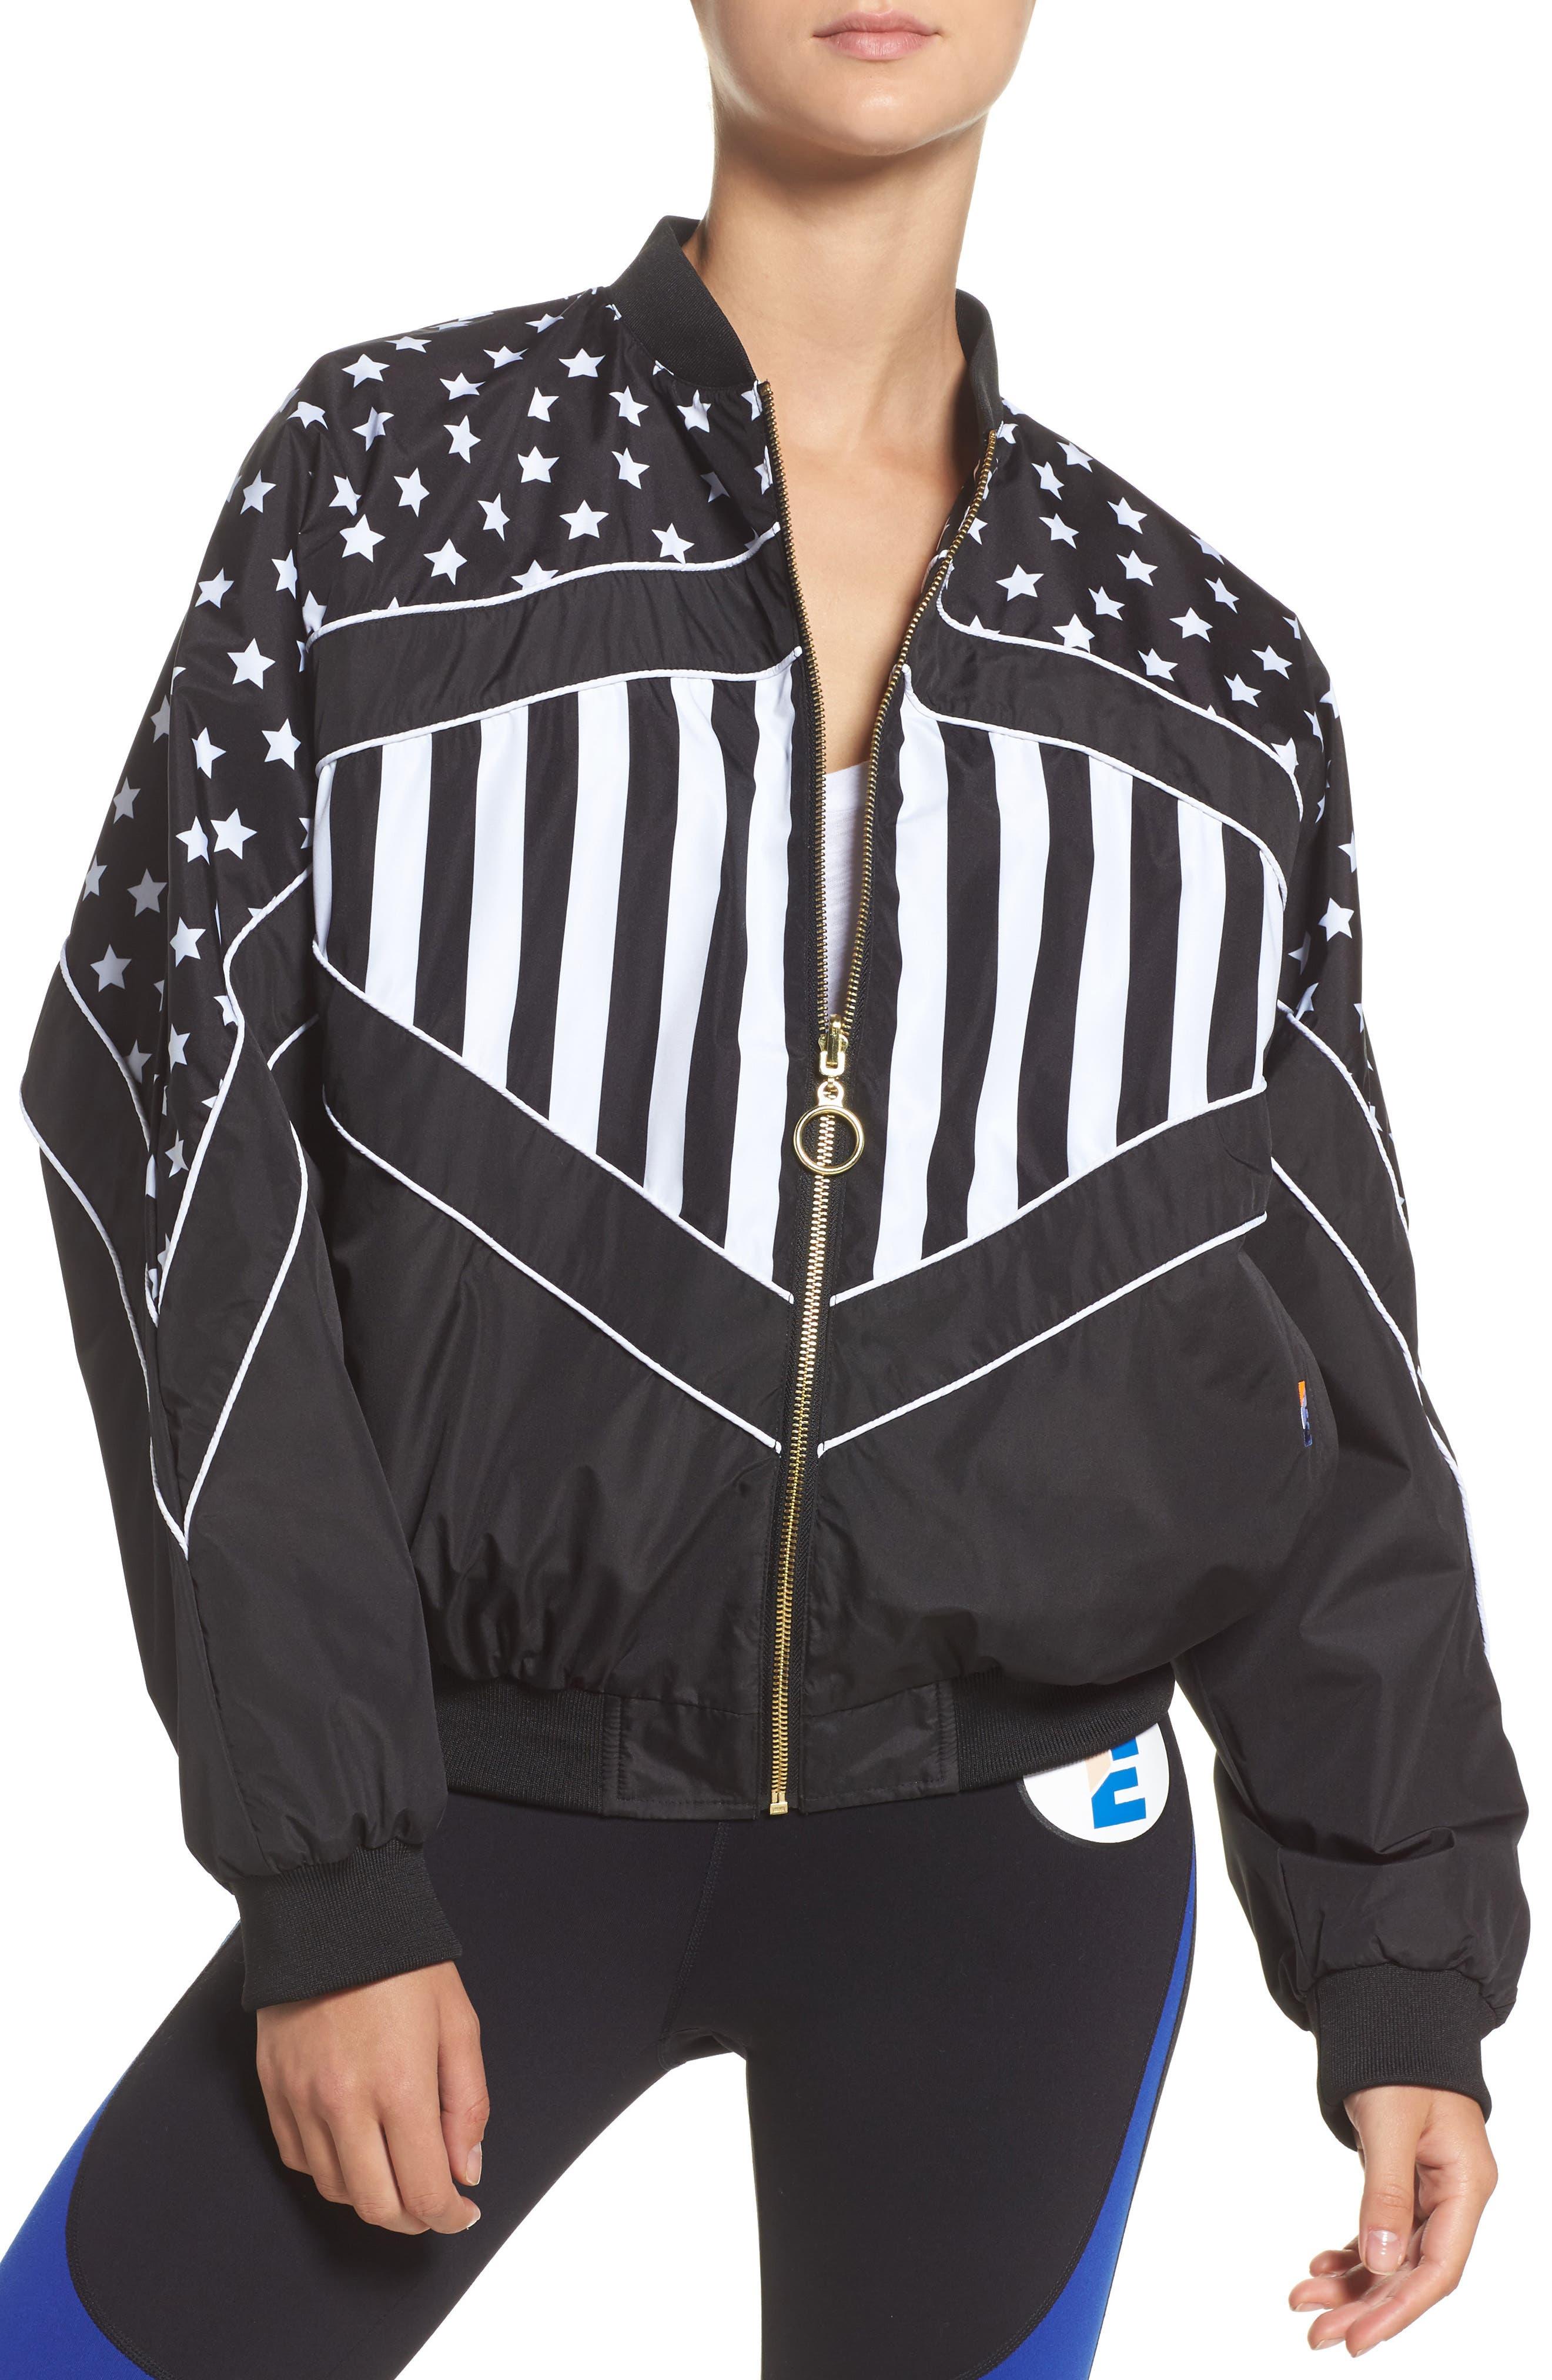 P.E Nation Wild Pitch Reversible Jacket